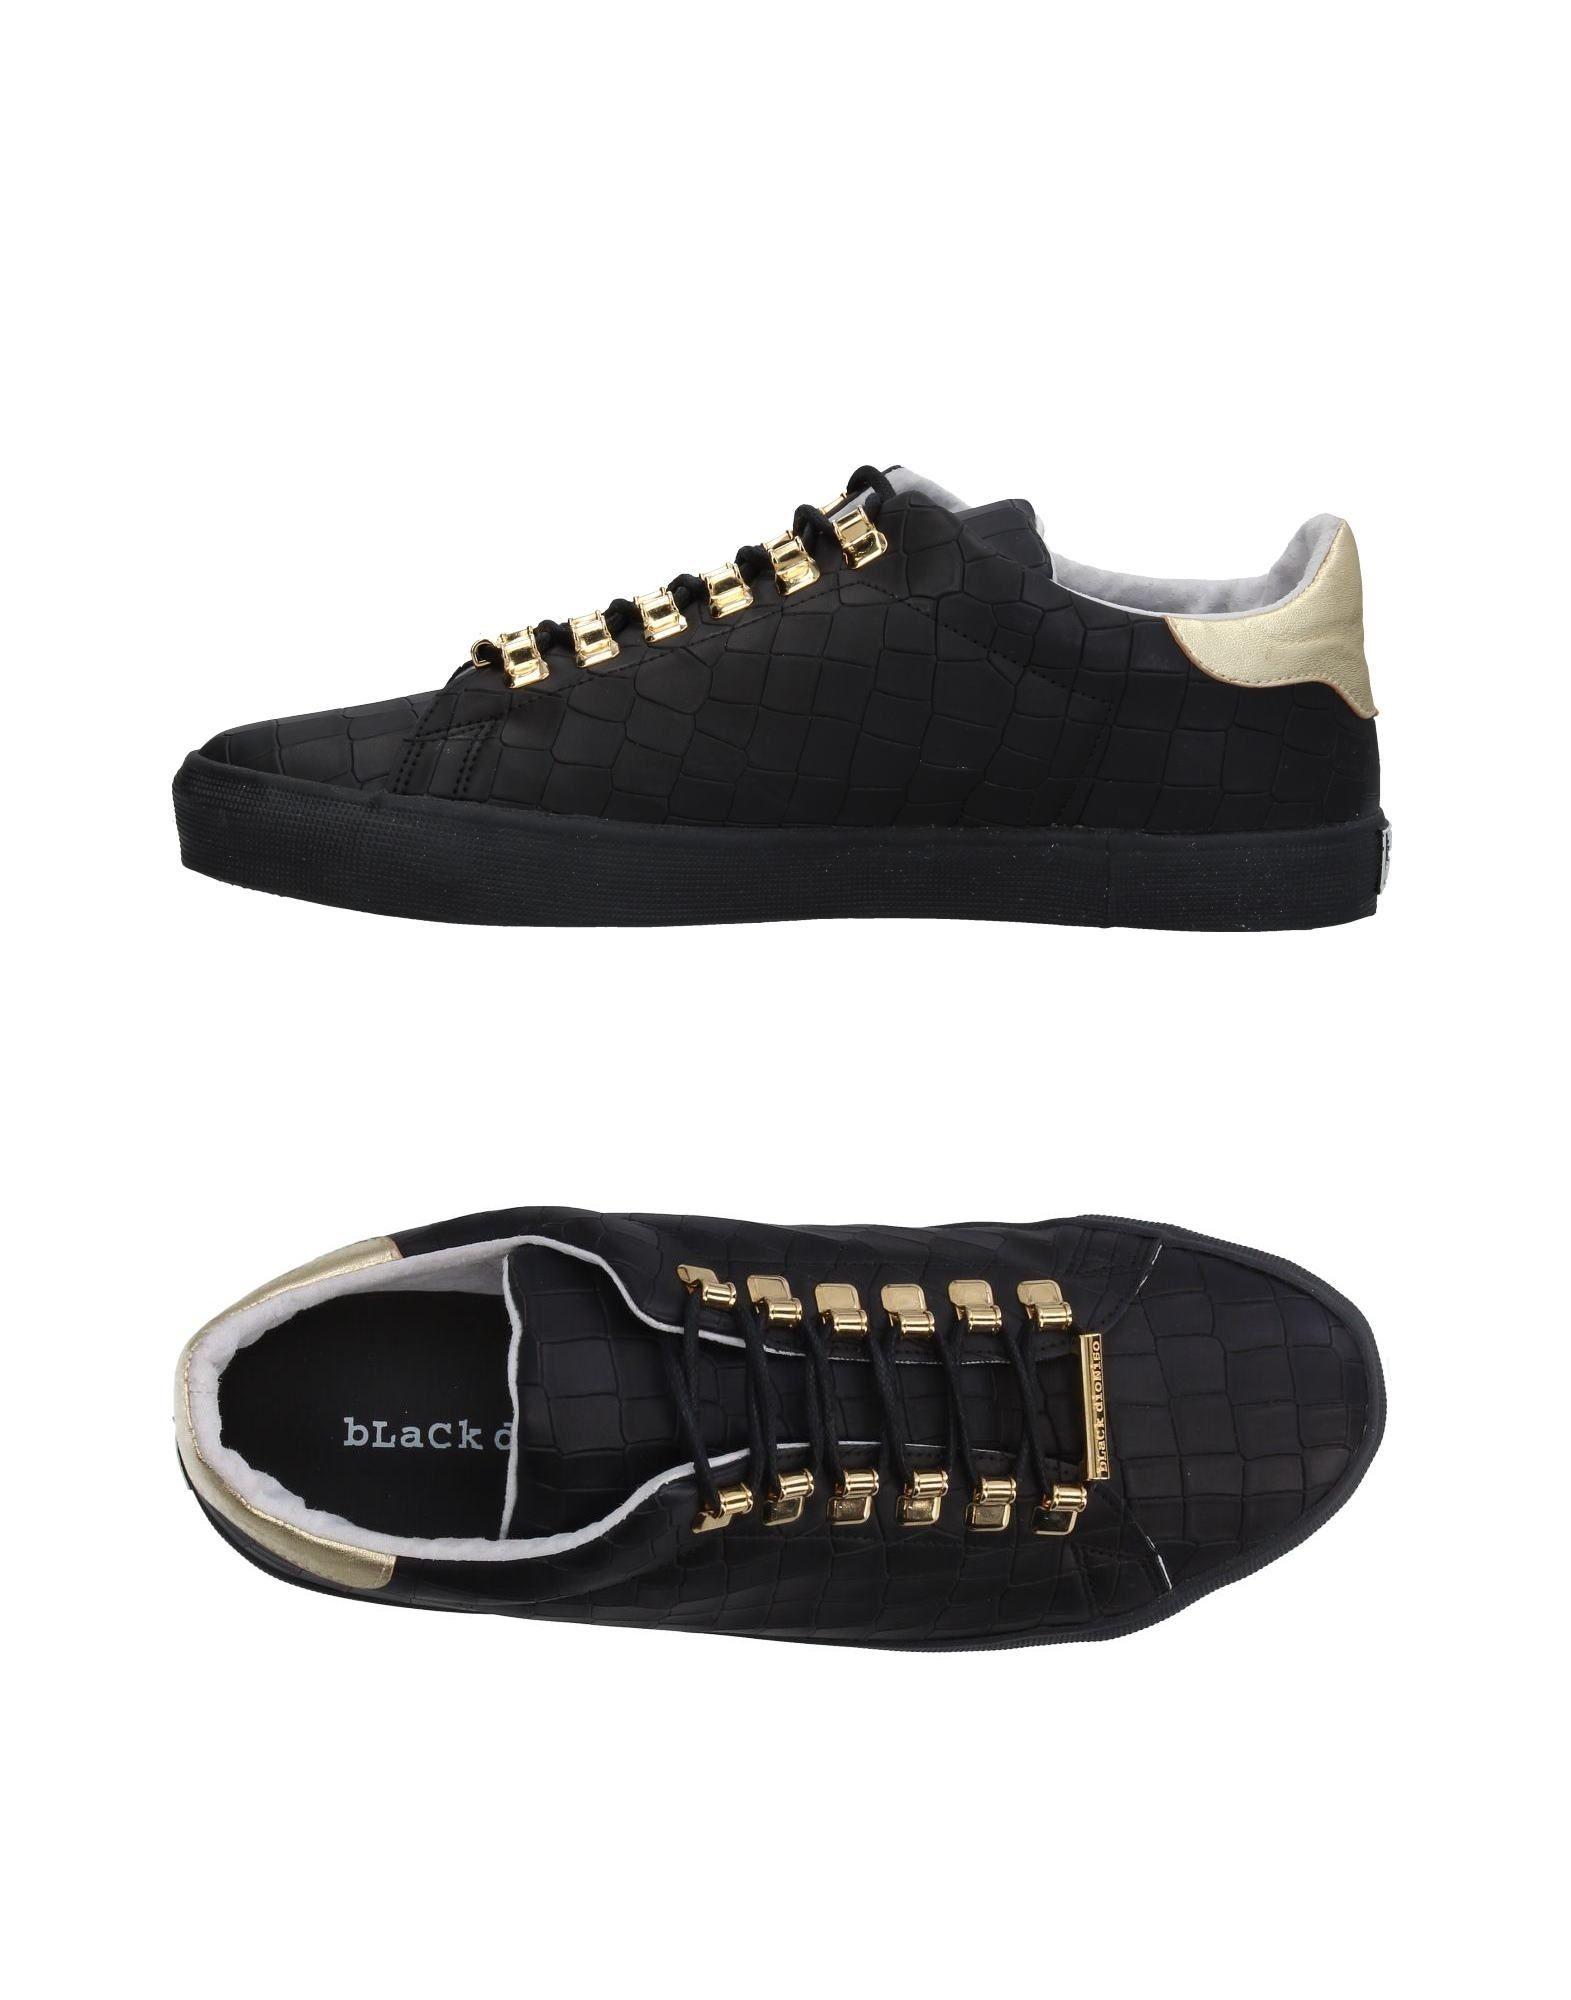 BLACK DIONISO Низкие кеды и кроссовки кеды кроссовки низкие reef ridge premium heathered black